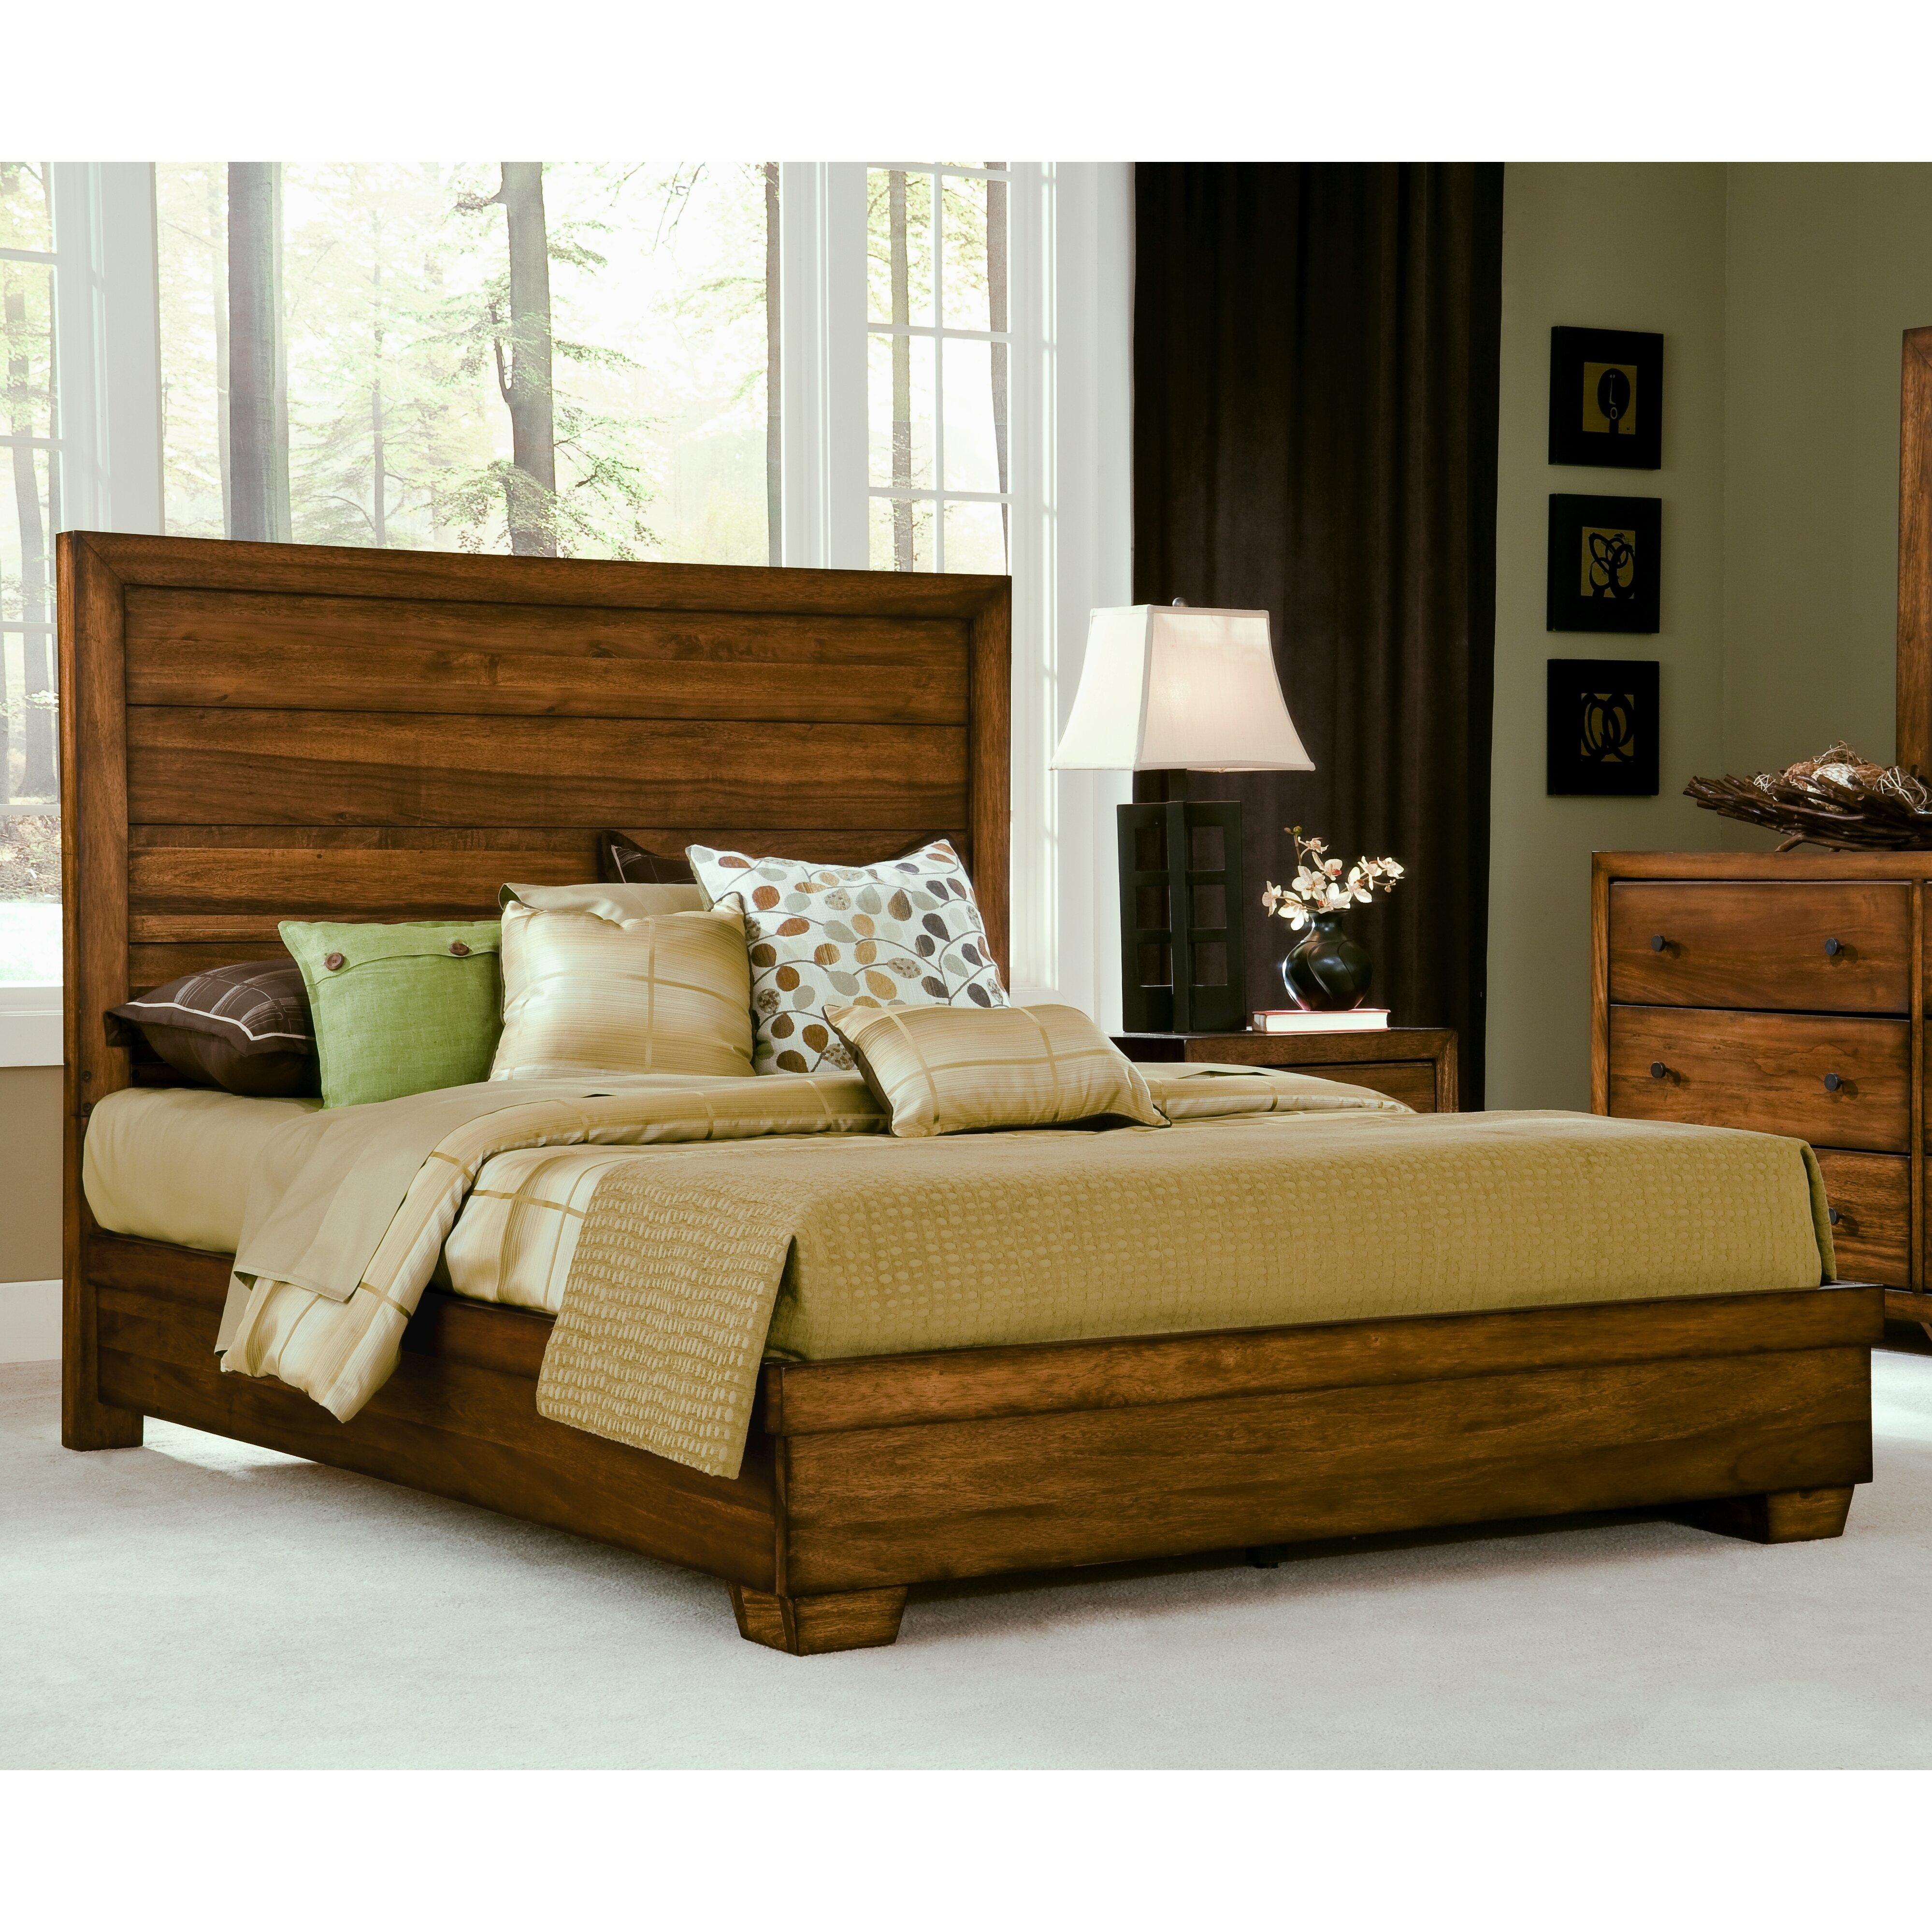 angelo HOME Chelsea Park Platform Customizable Bedroom Set. angelo HOME Chelsea Park Platform Customizable Bedroom Set